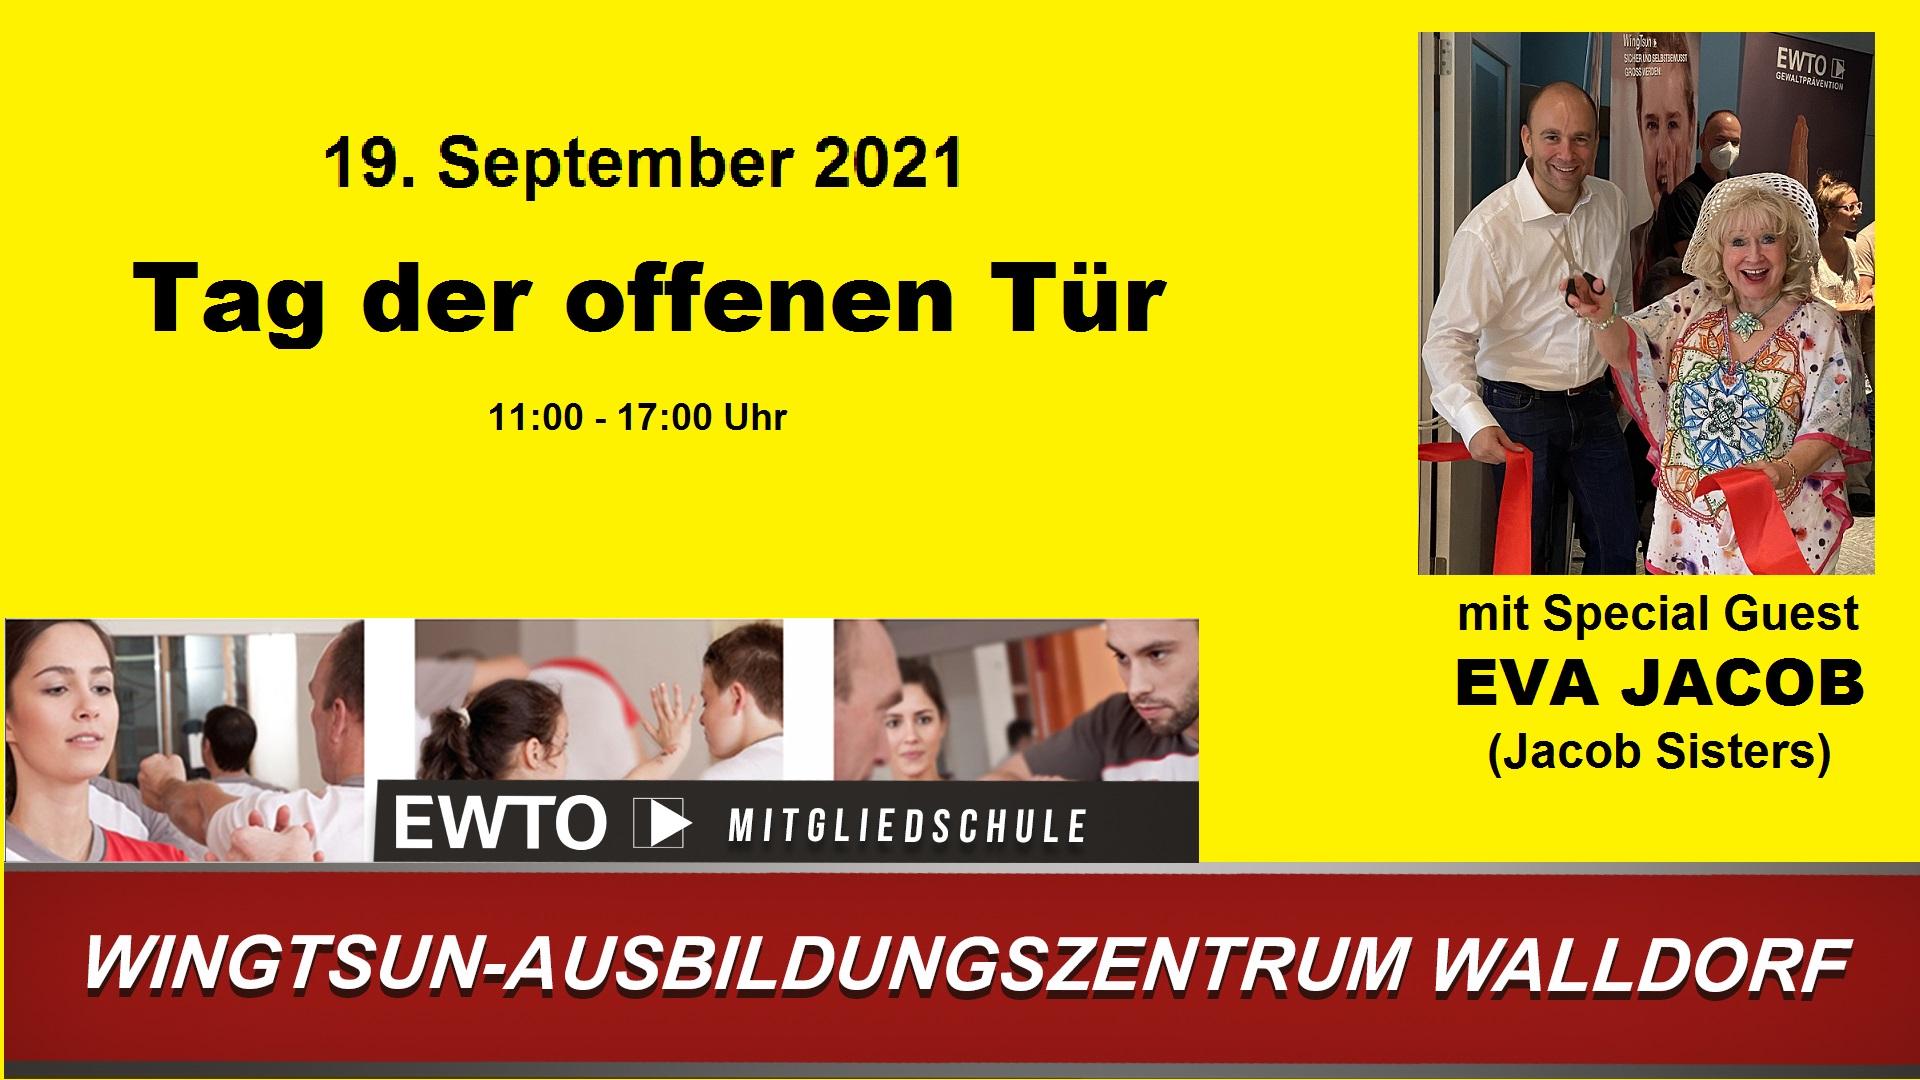 WingTsun Walldorf - Tag der offenen Tür 19.September 2021